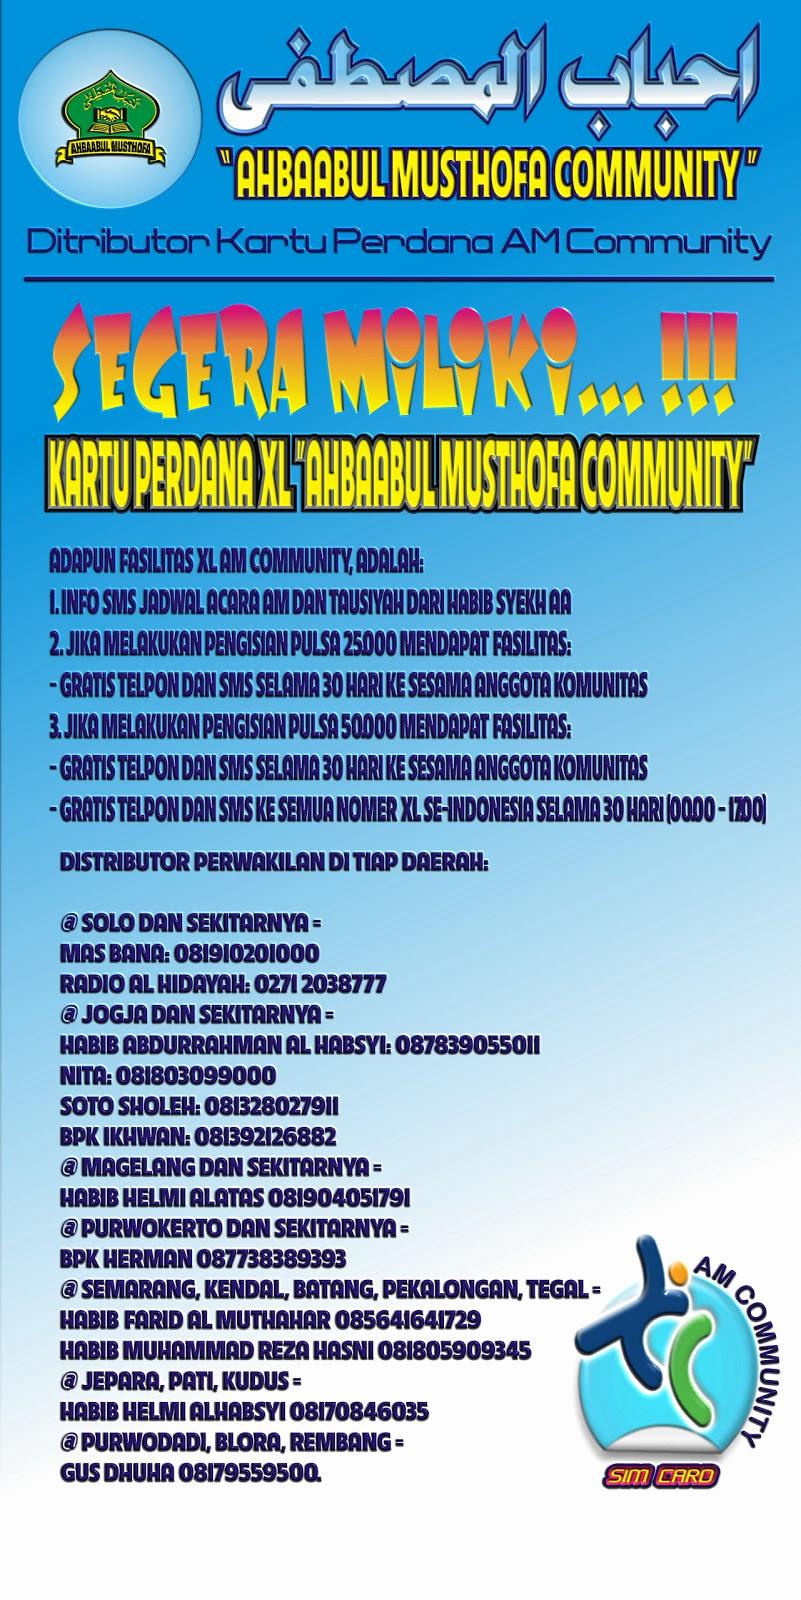 Miliki Segera Kartu Perdana Xl Habib Syech Bin Abdul Qodir Assegaf